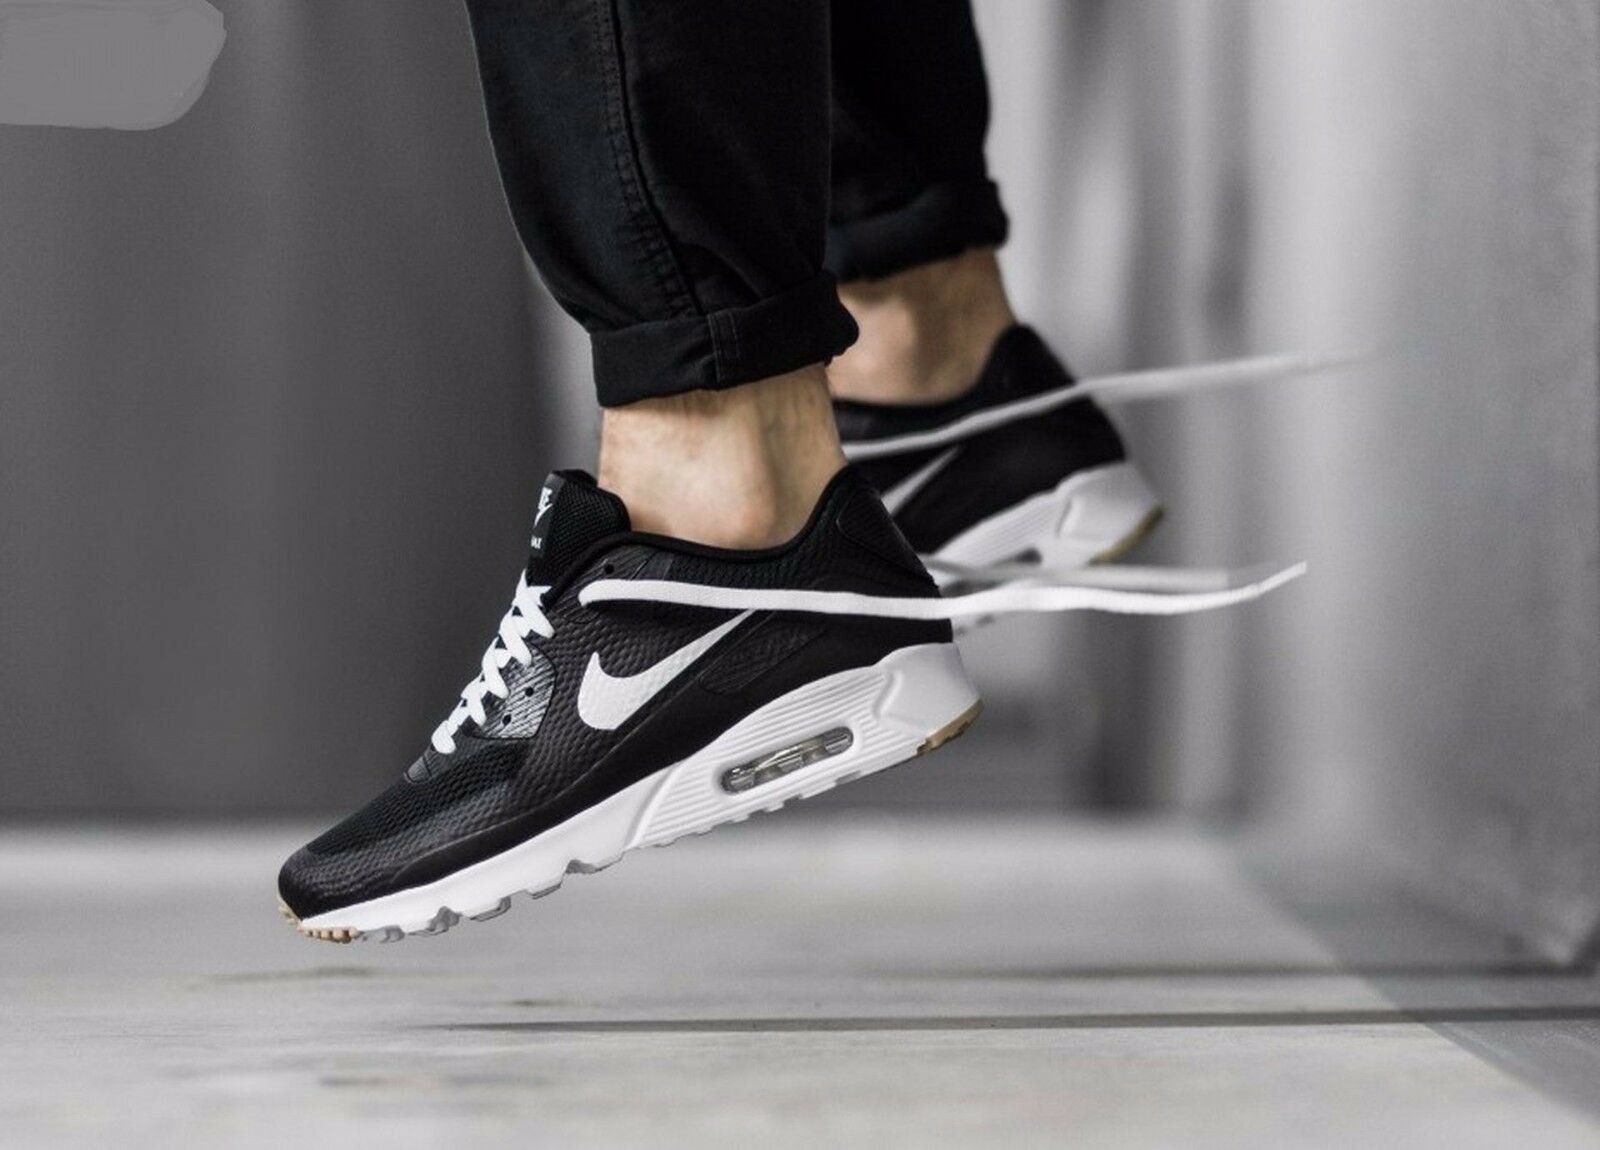 Nike air max 90 extrem - wichtig - extrem schwarz -  819474 010 mens sz. 89881c